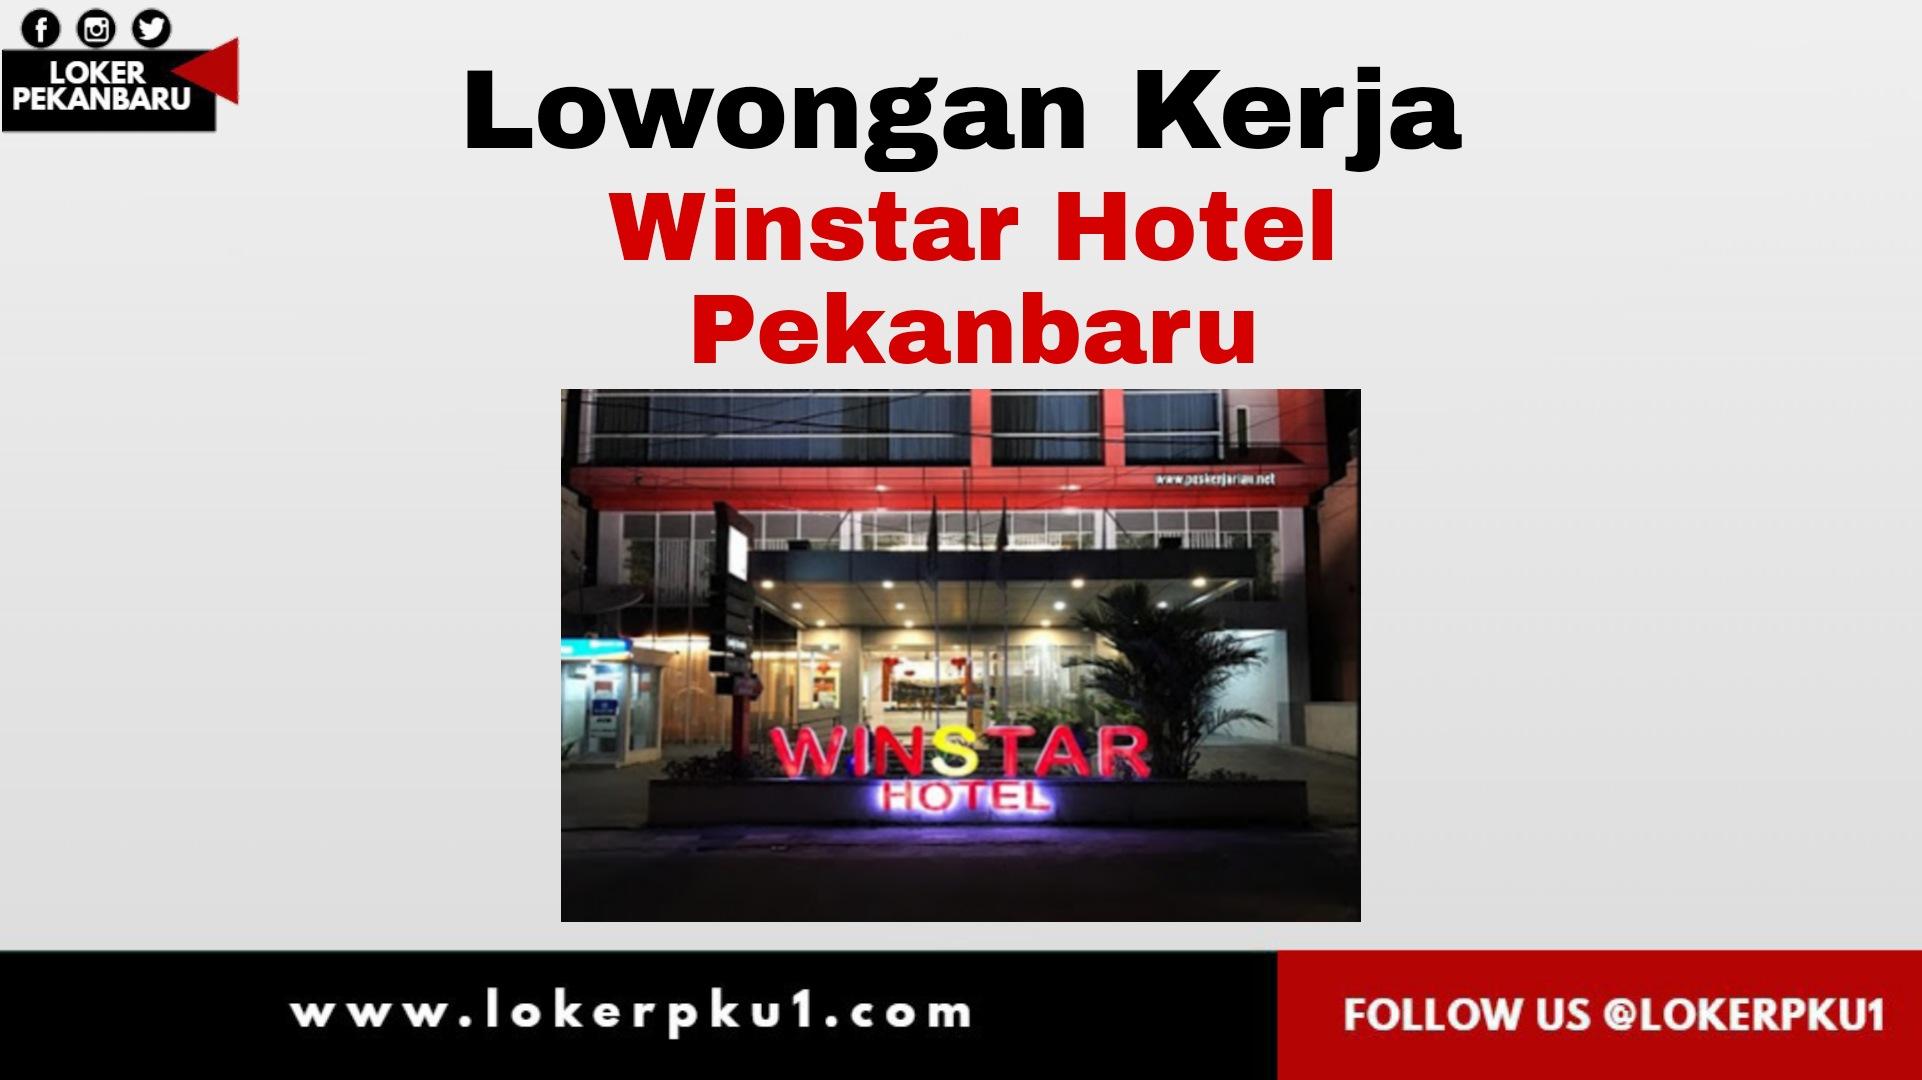 Lowongan Kerja Winstar Hotel Pekanbaru Desember 2020